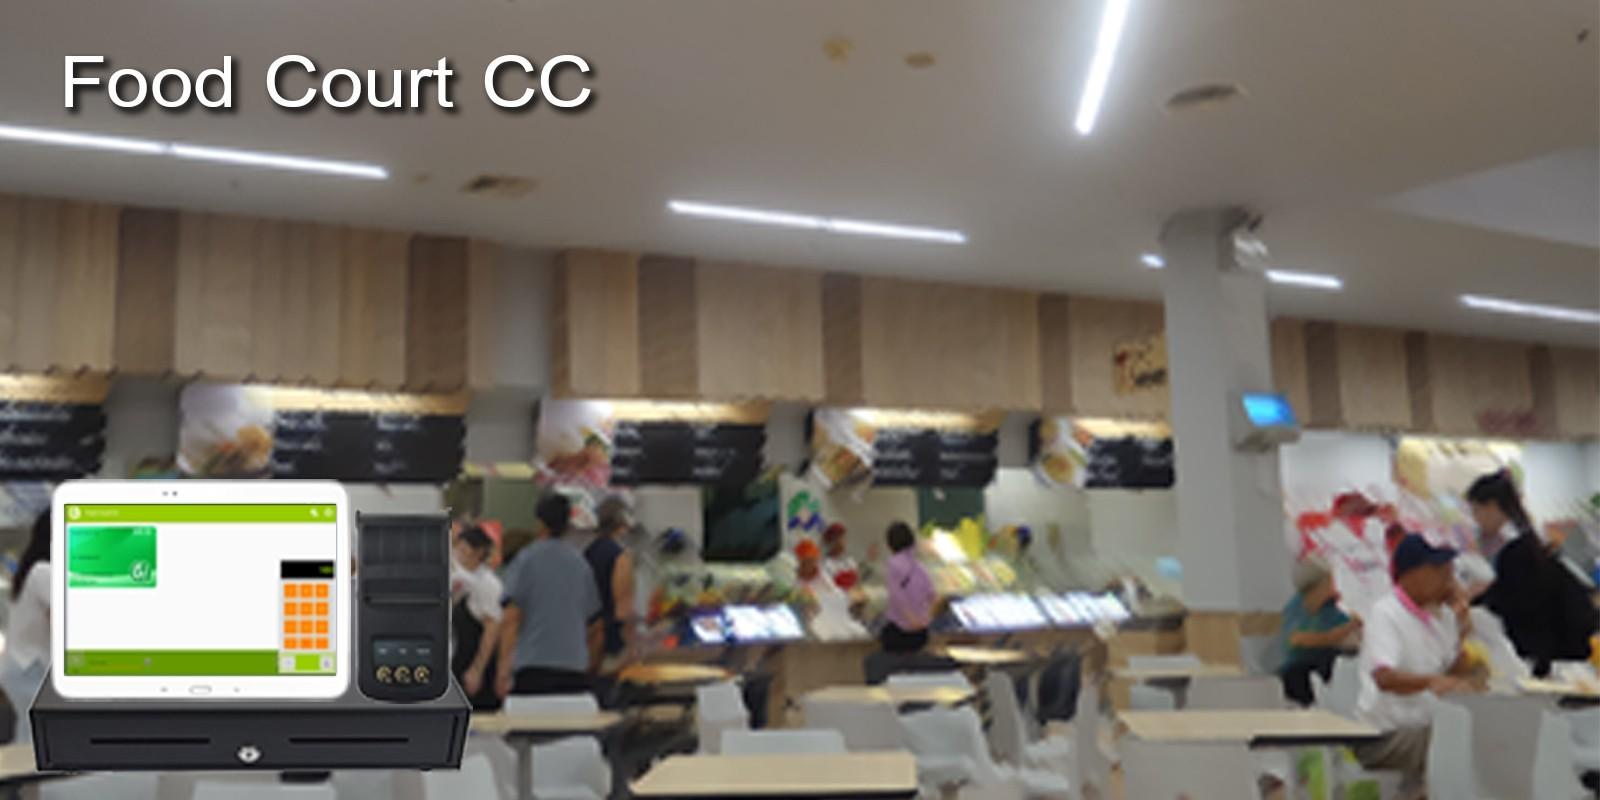 Food Court CC